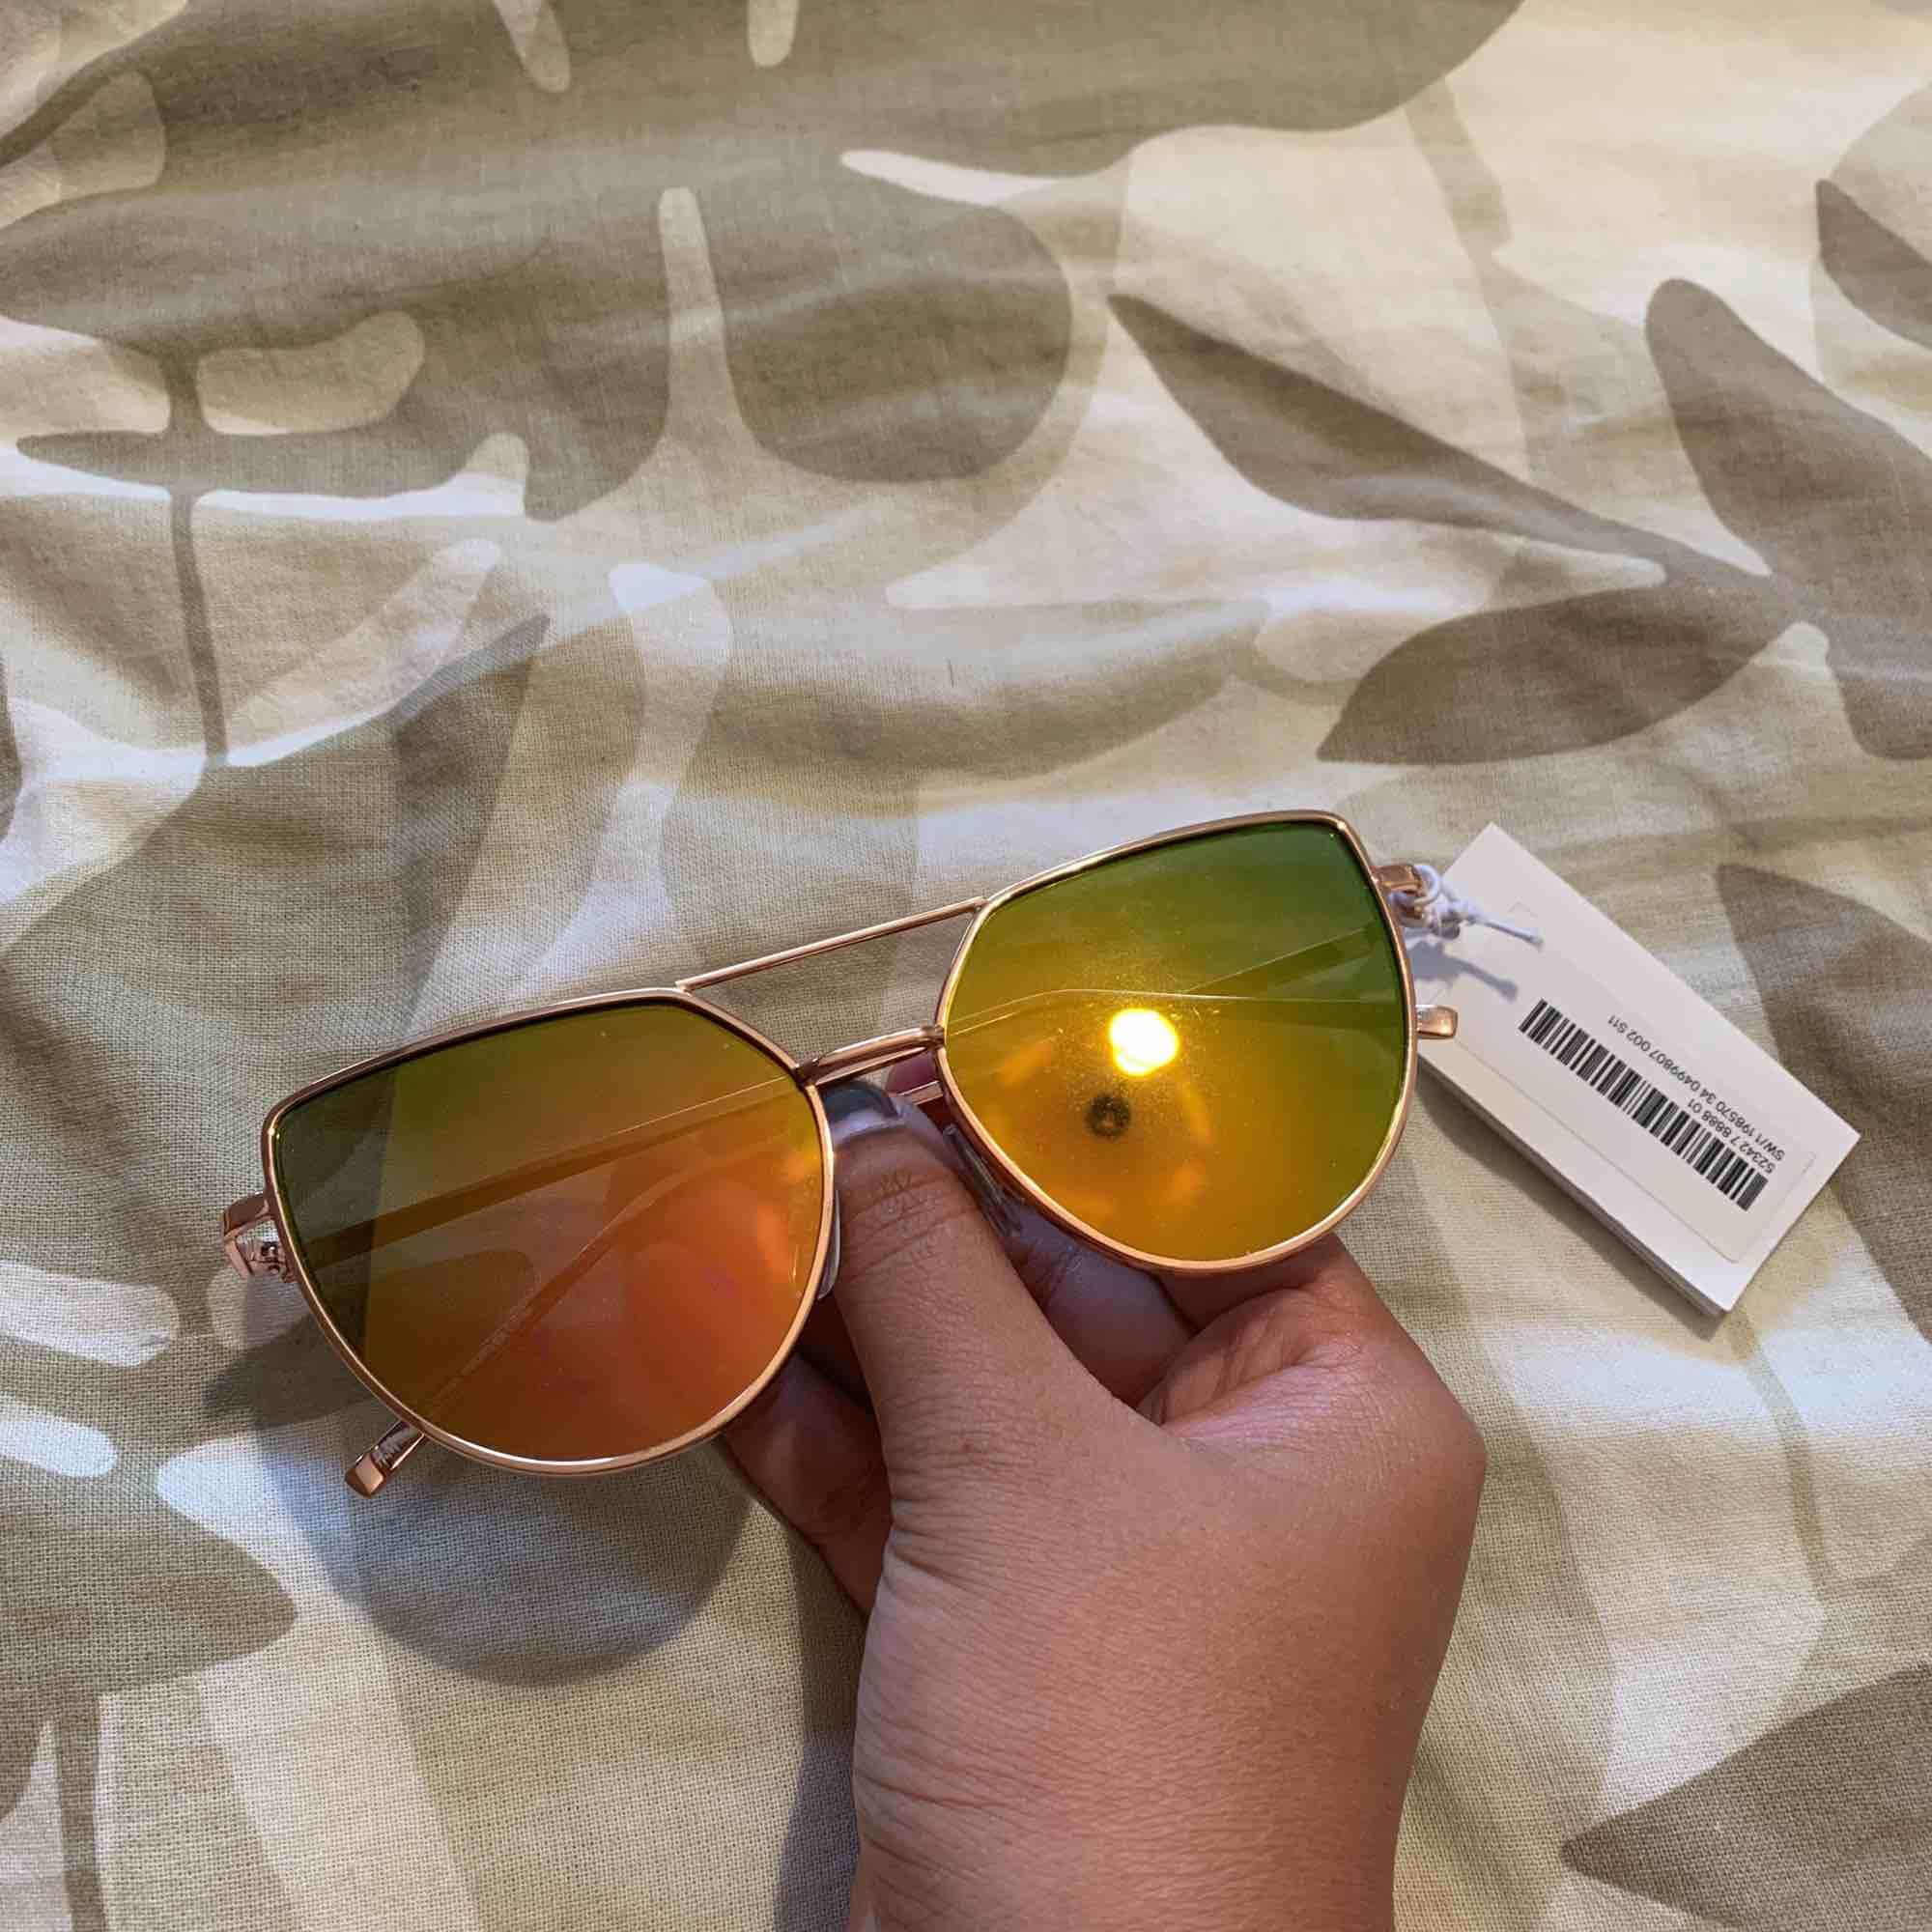 Nya solglasögon med prislapp kvar ☺️☺️☺️. Accessoarer.